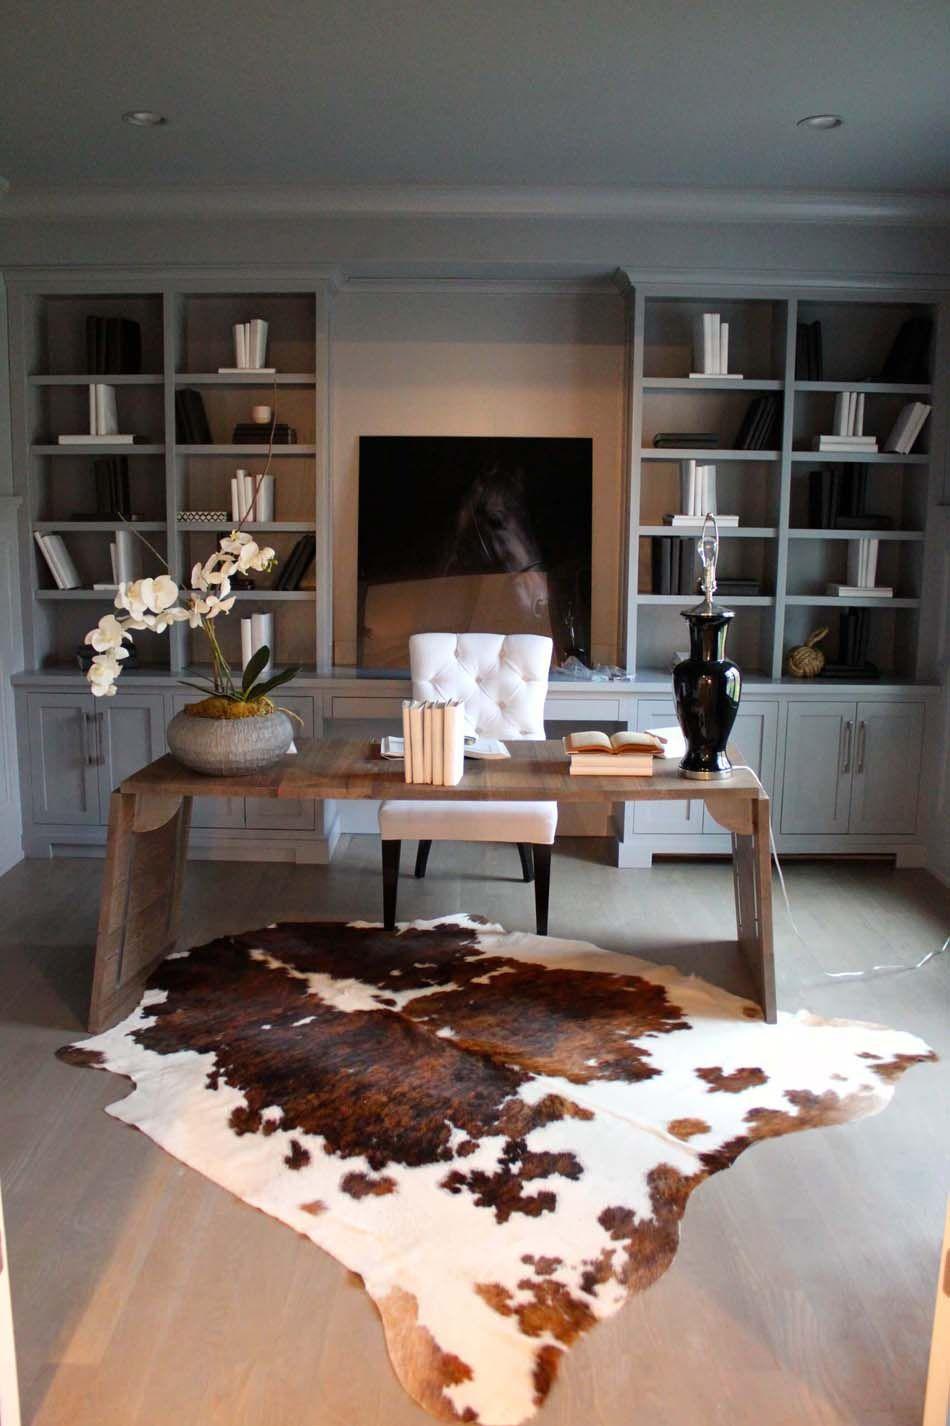 design-masculin-sombre-amenager-bureau-maison design-masculin-sombre ...